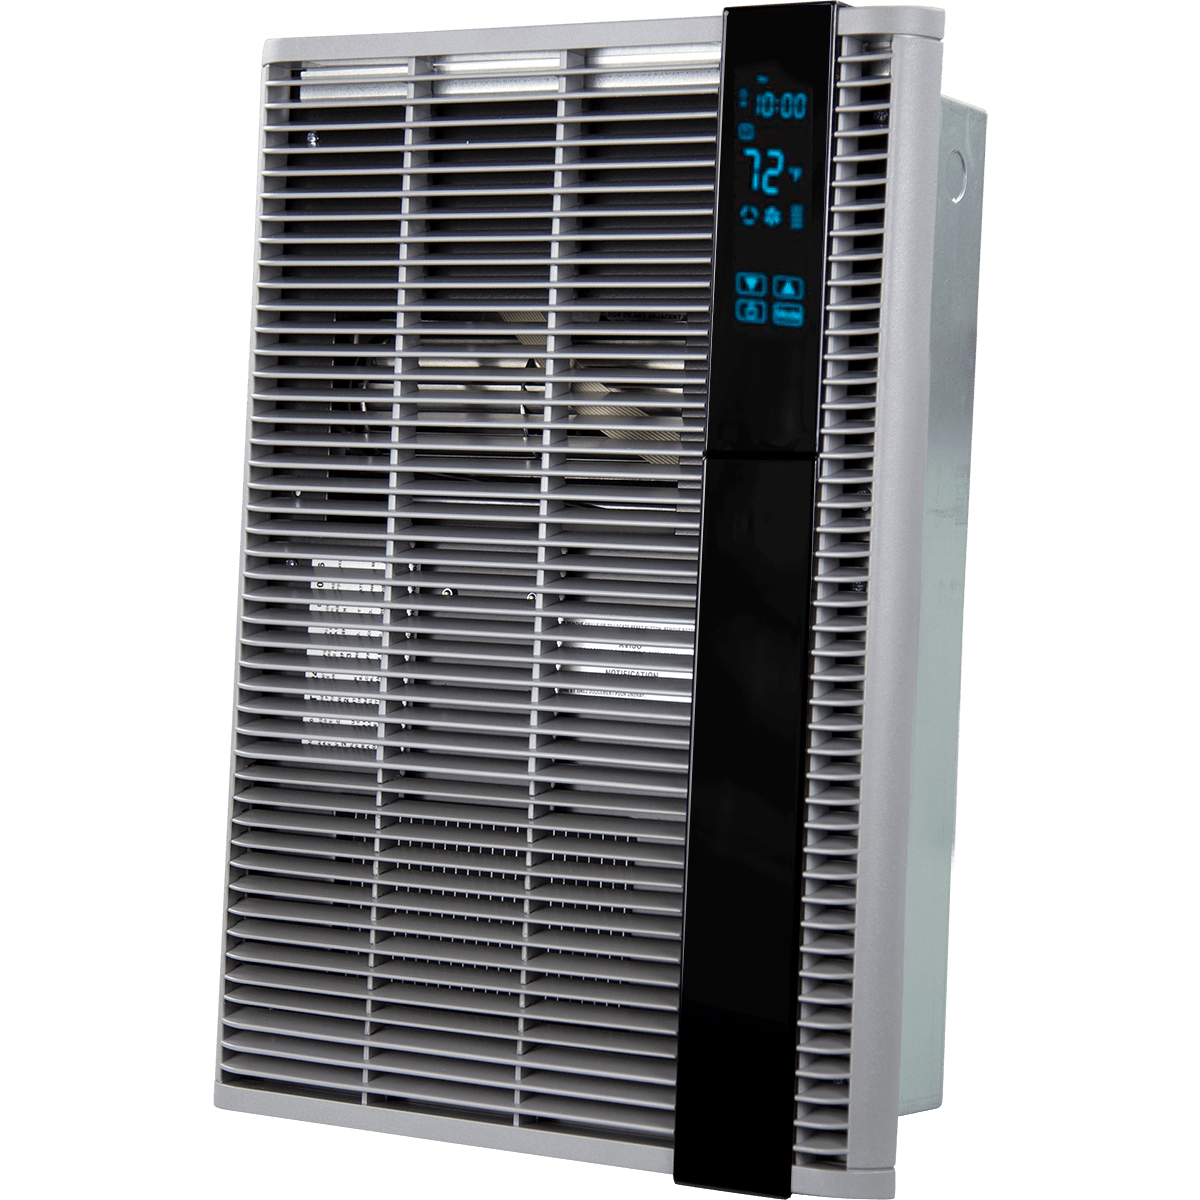 QMark HT Smart Series 240V Programmable Digital Wall Heater Model: HT2024SS